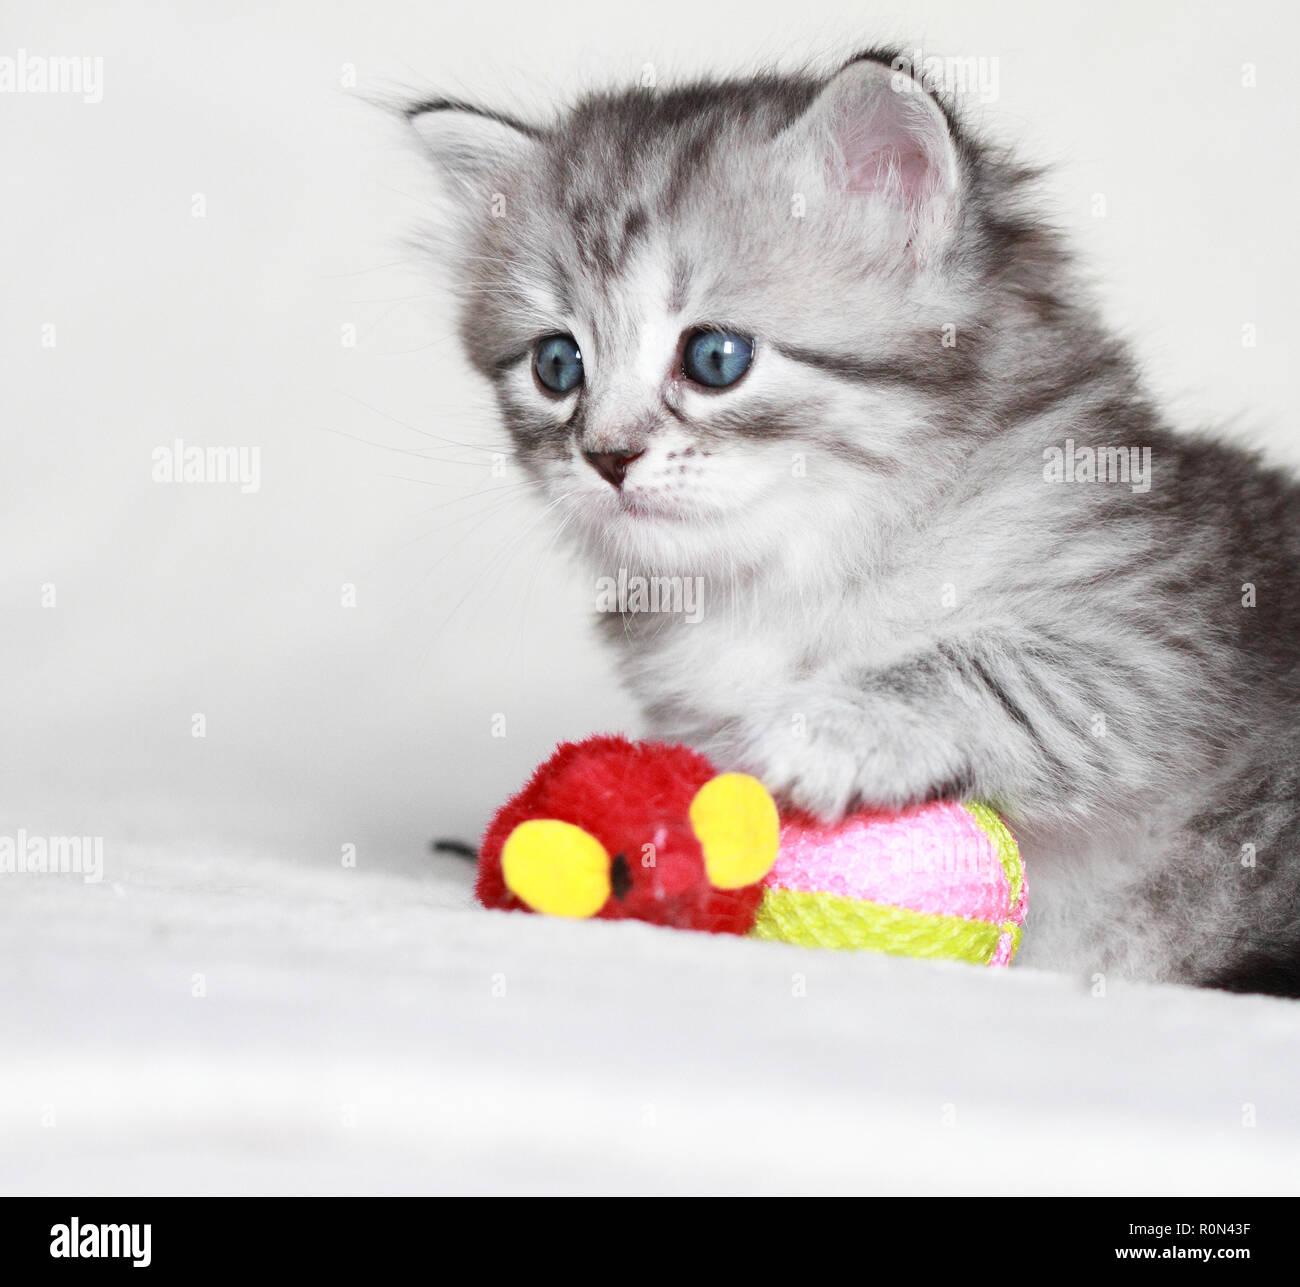 Adorable chiot chat jouant en hiver Photo Stock